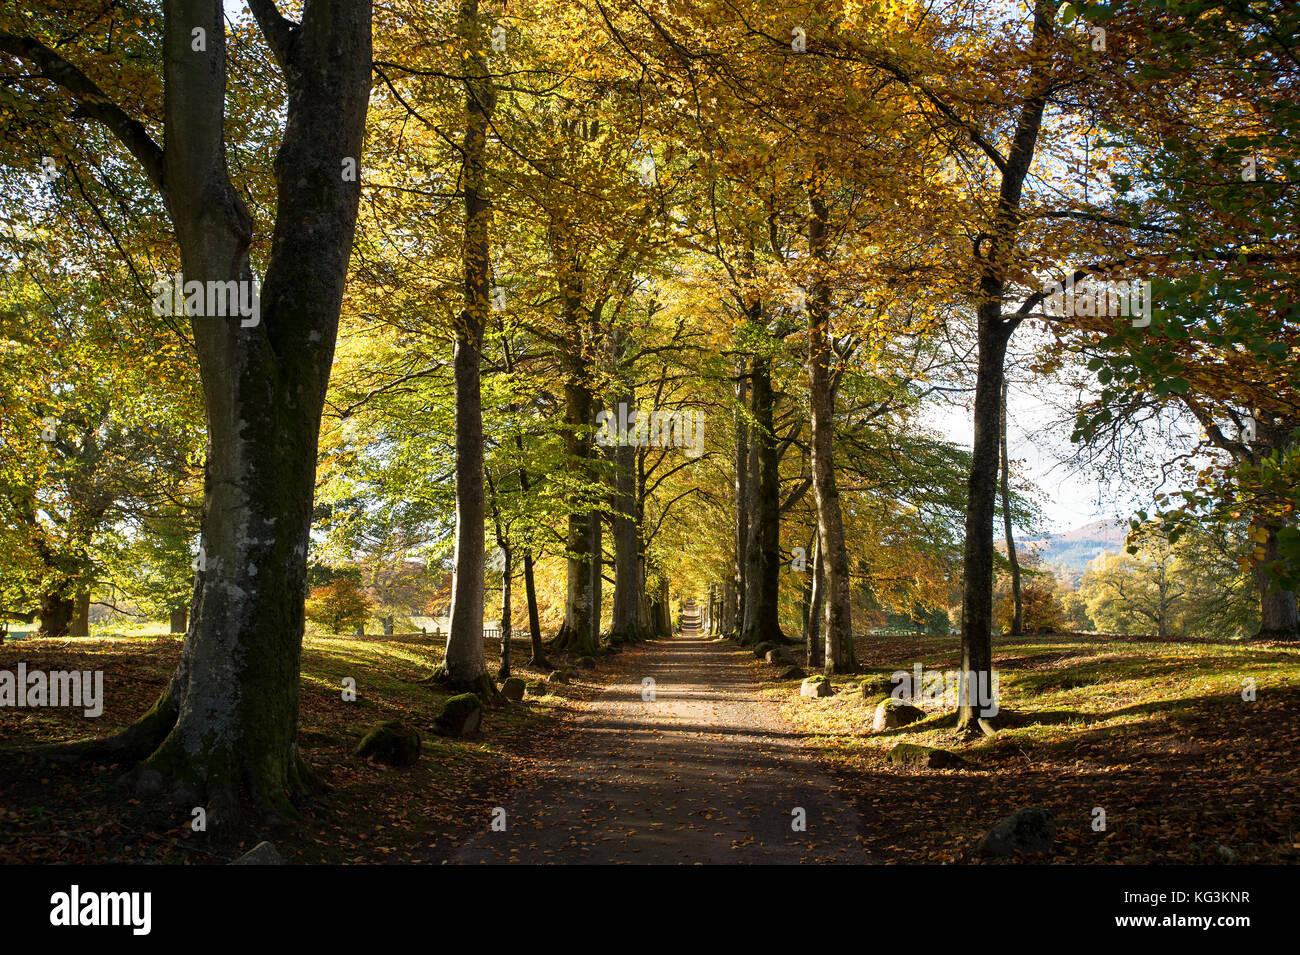 Avenida de lenga en la entrada de Drummond Gardens, cerca de Crieff, Perthshire, Escocia. Foto de stock